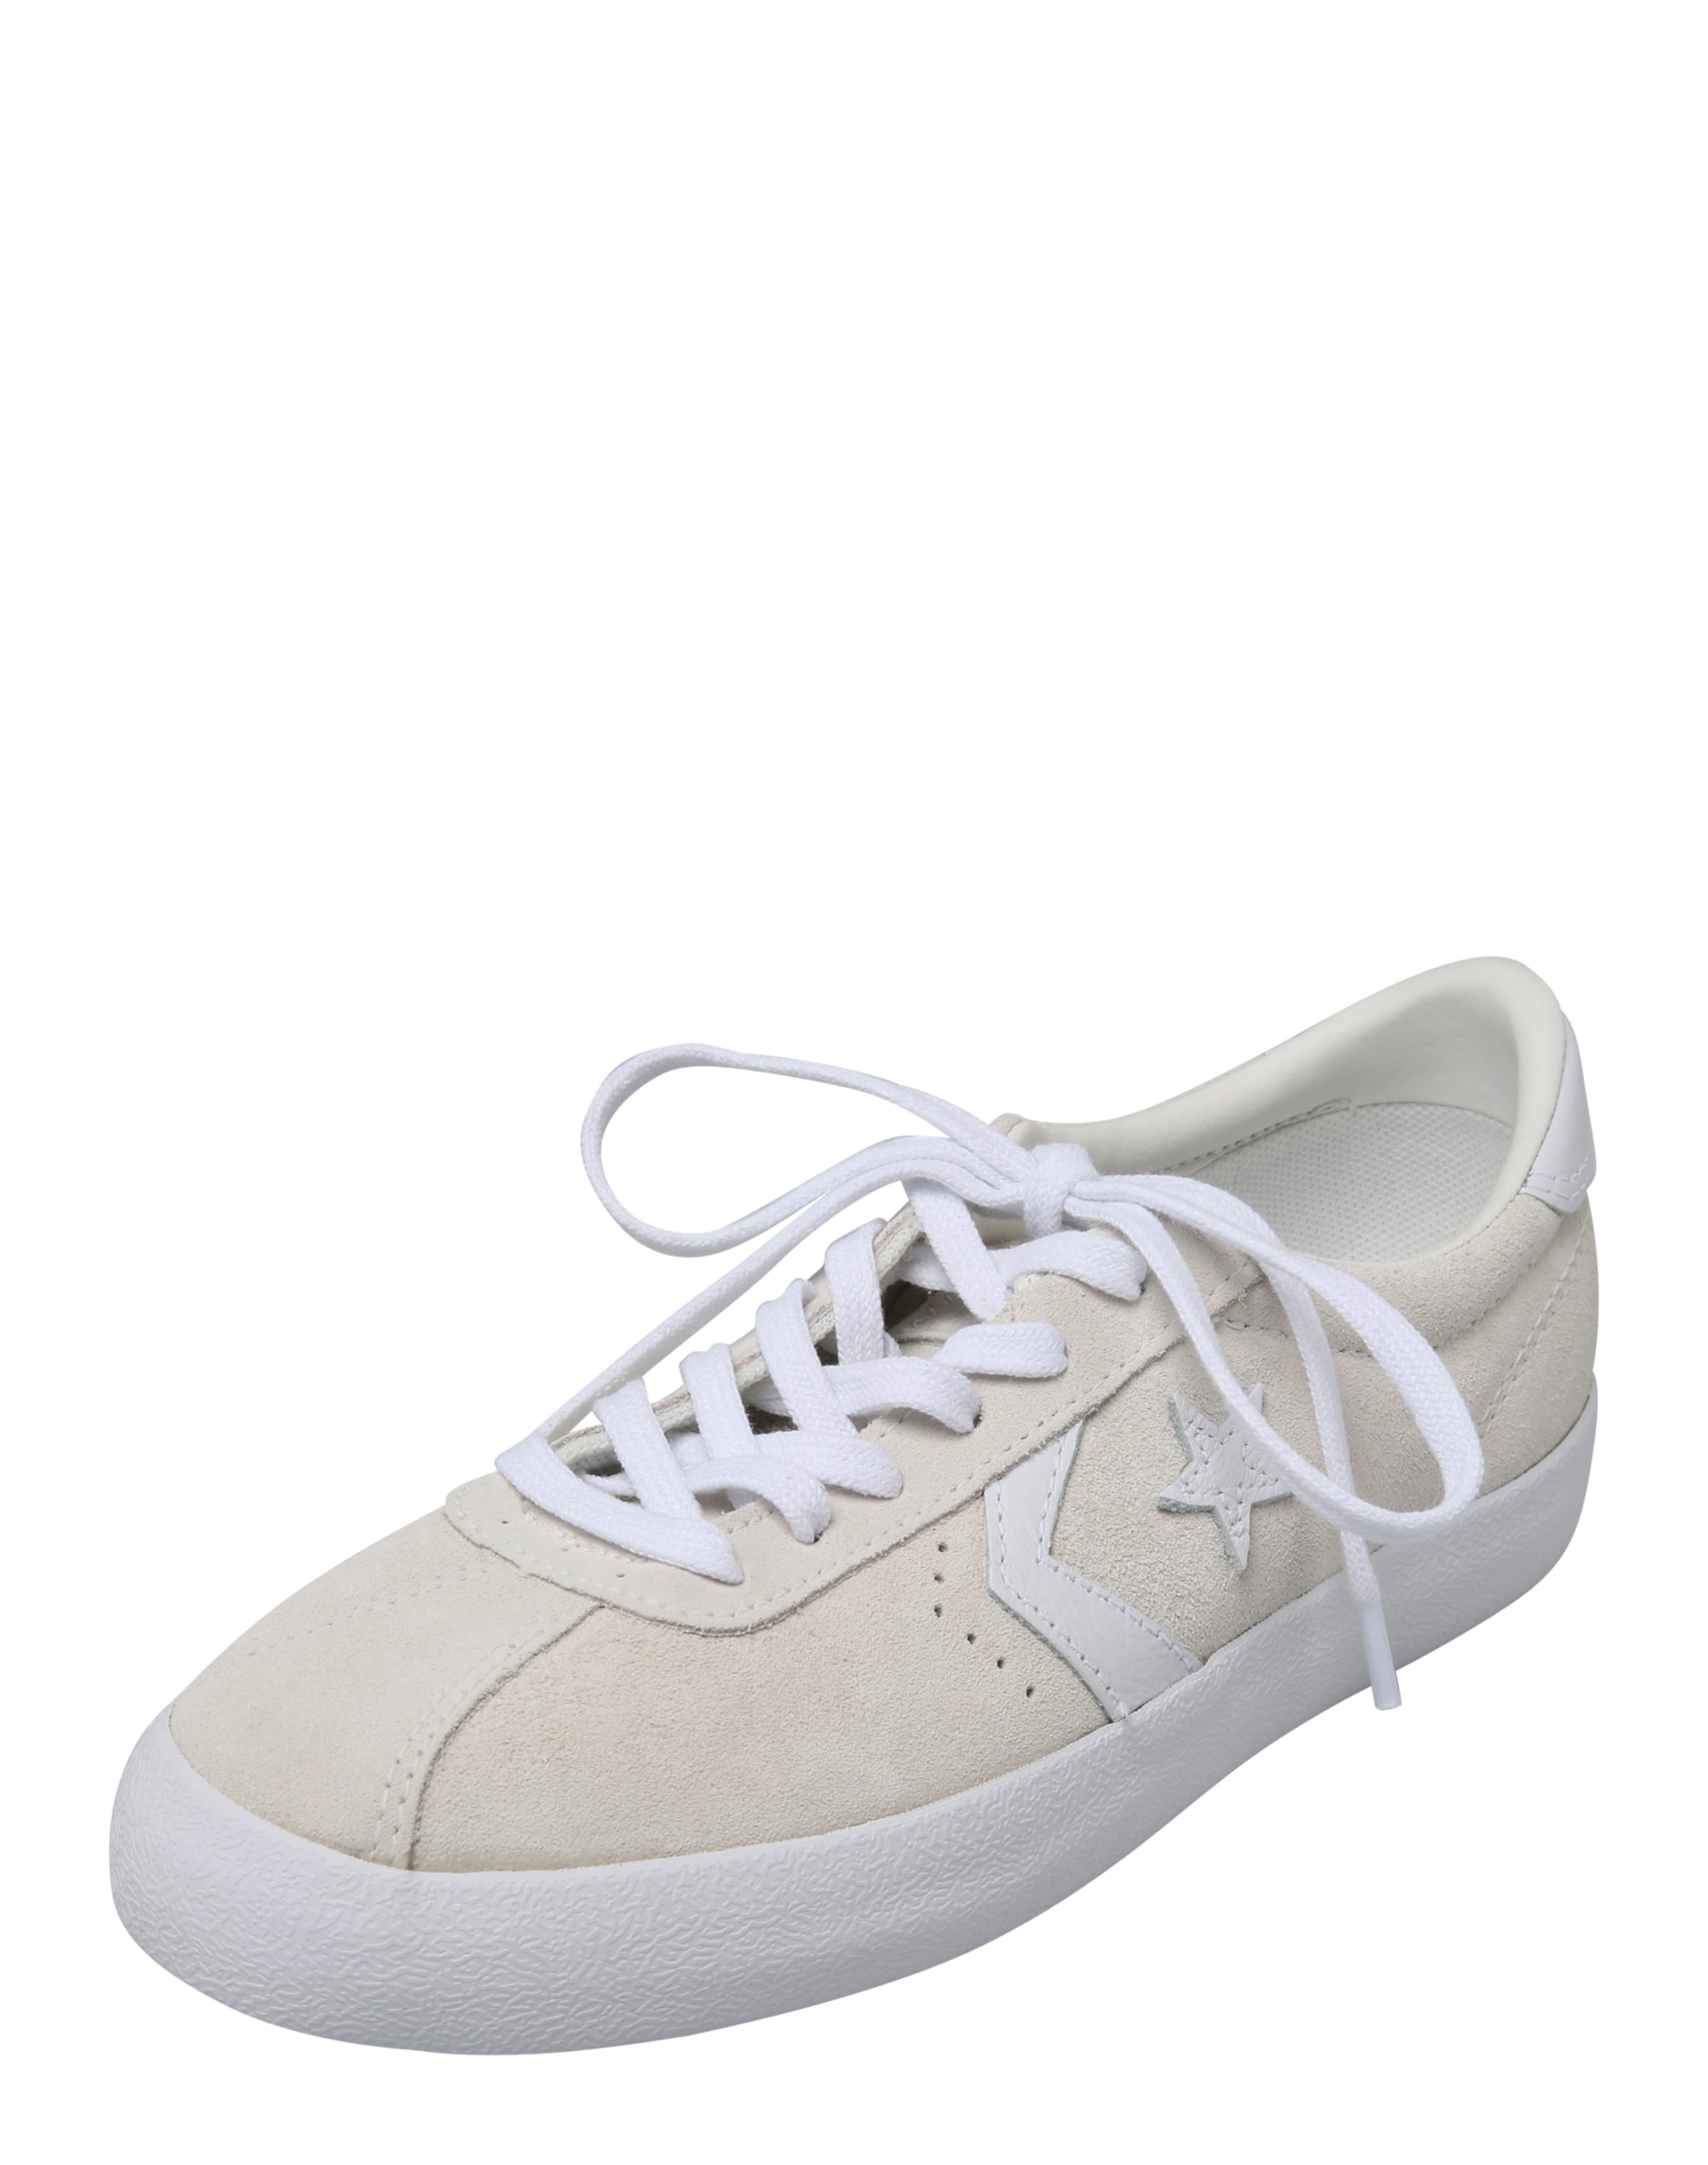 CONVERSE Sneakers Breakpoint Verschleißfeste billige Schuhe